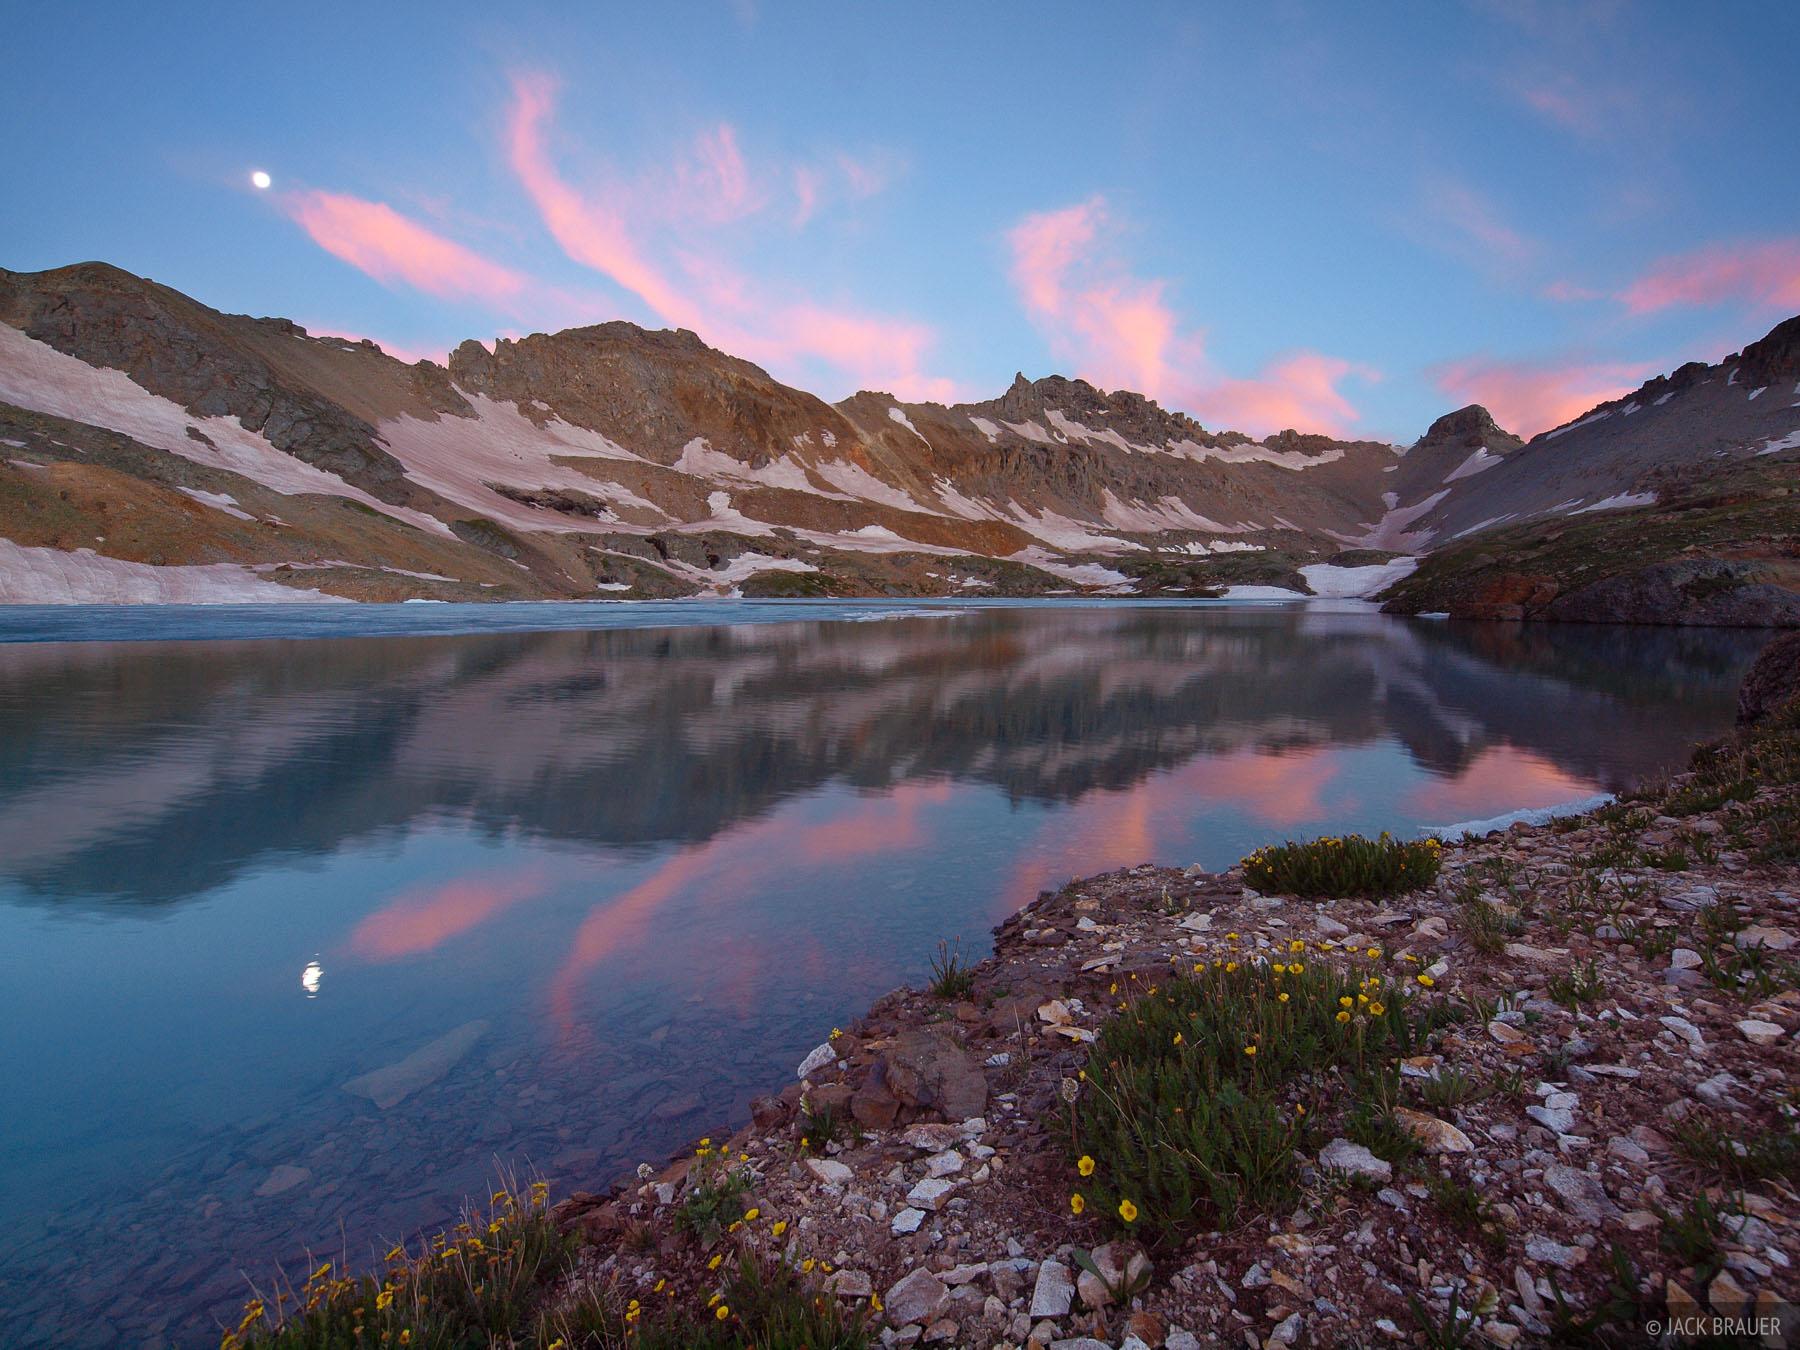 Columbine Lake, Lookout Mountain, sunrise, San Juan Mountains, Colorado, photo